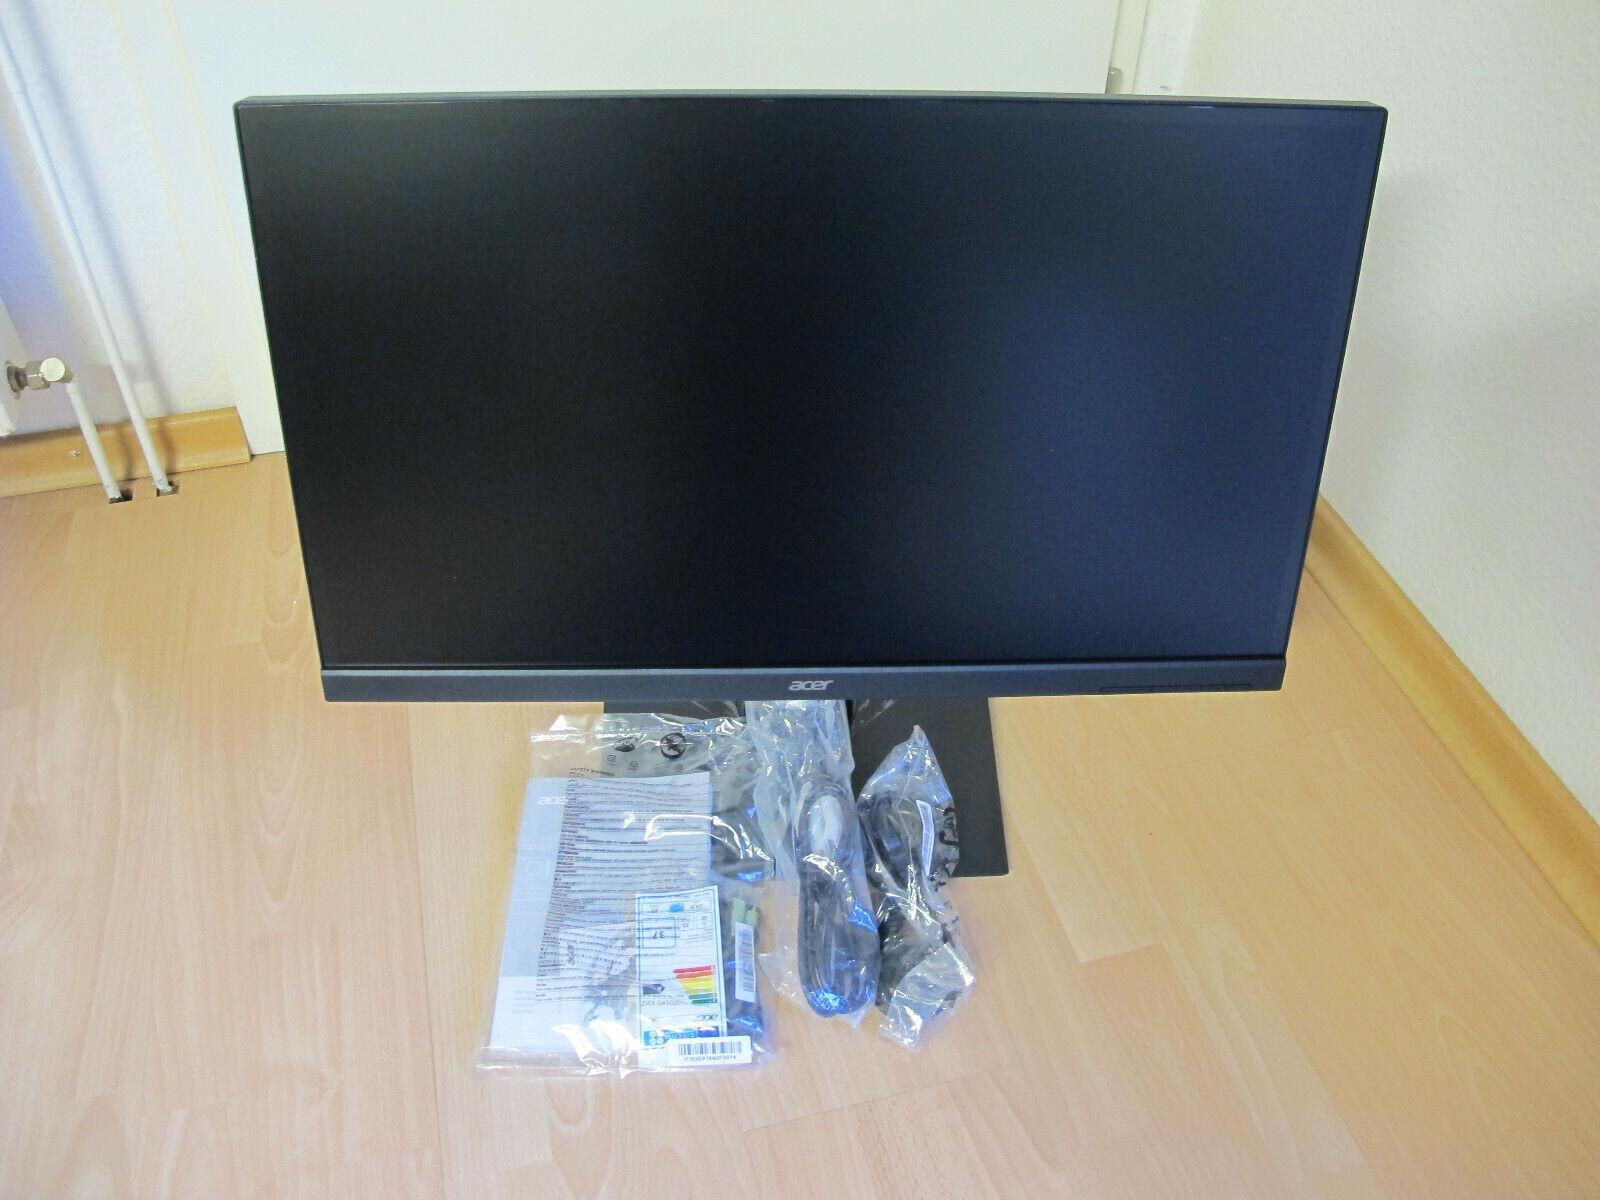 Acer (B-Ware) Monitor CB271HB neuwertig in OVP